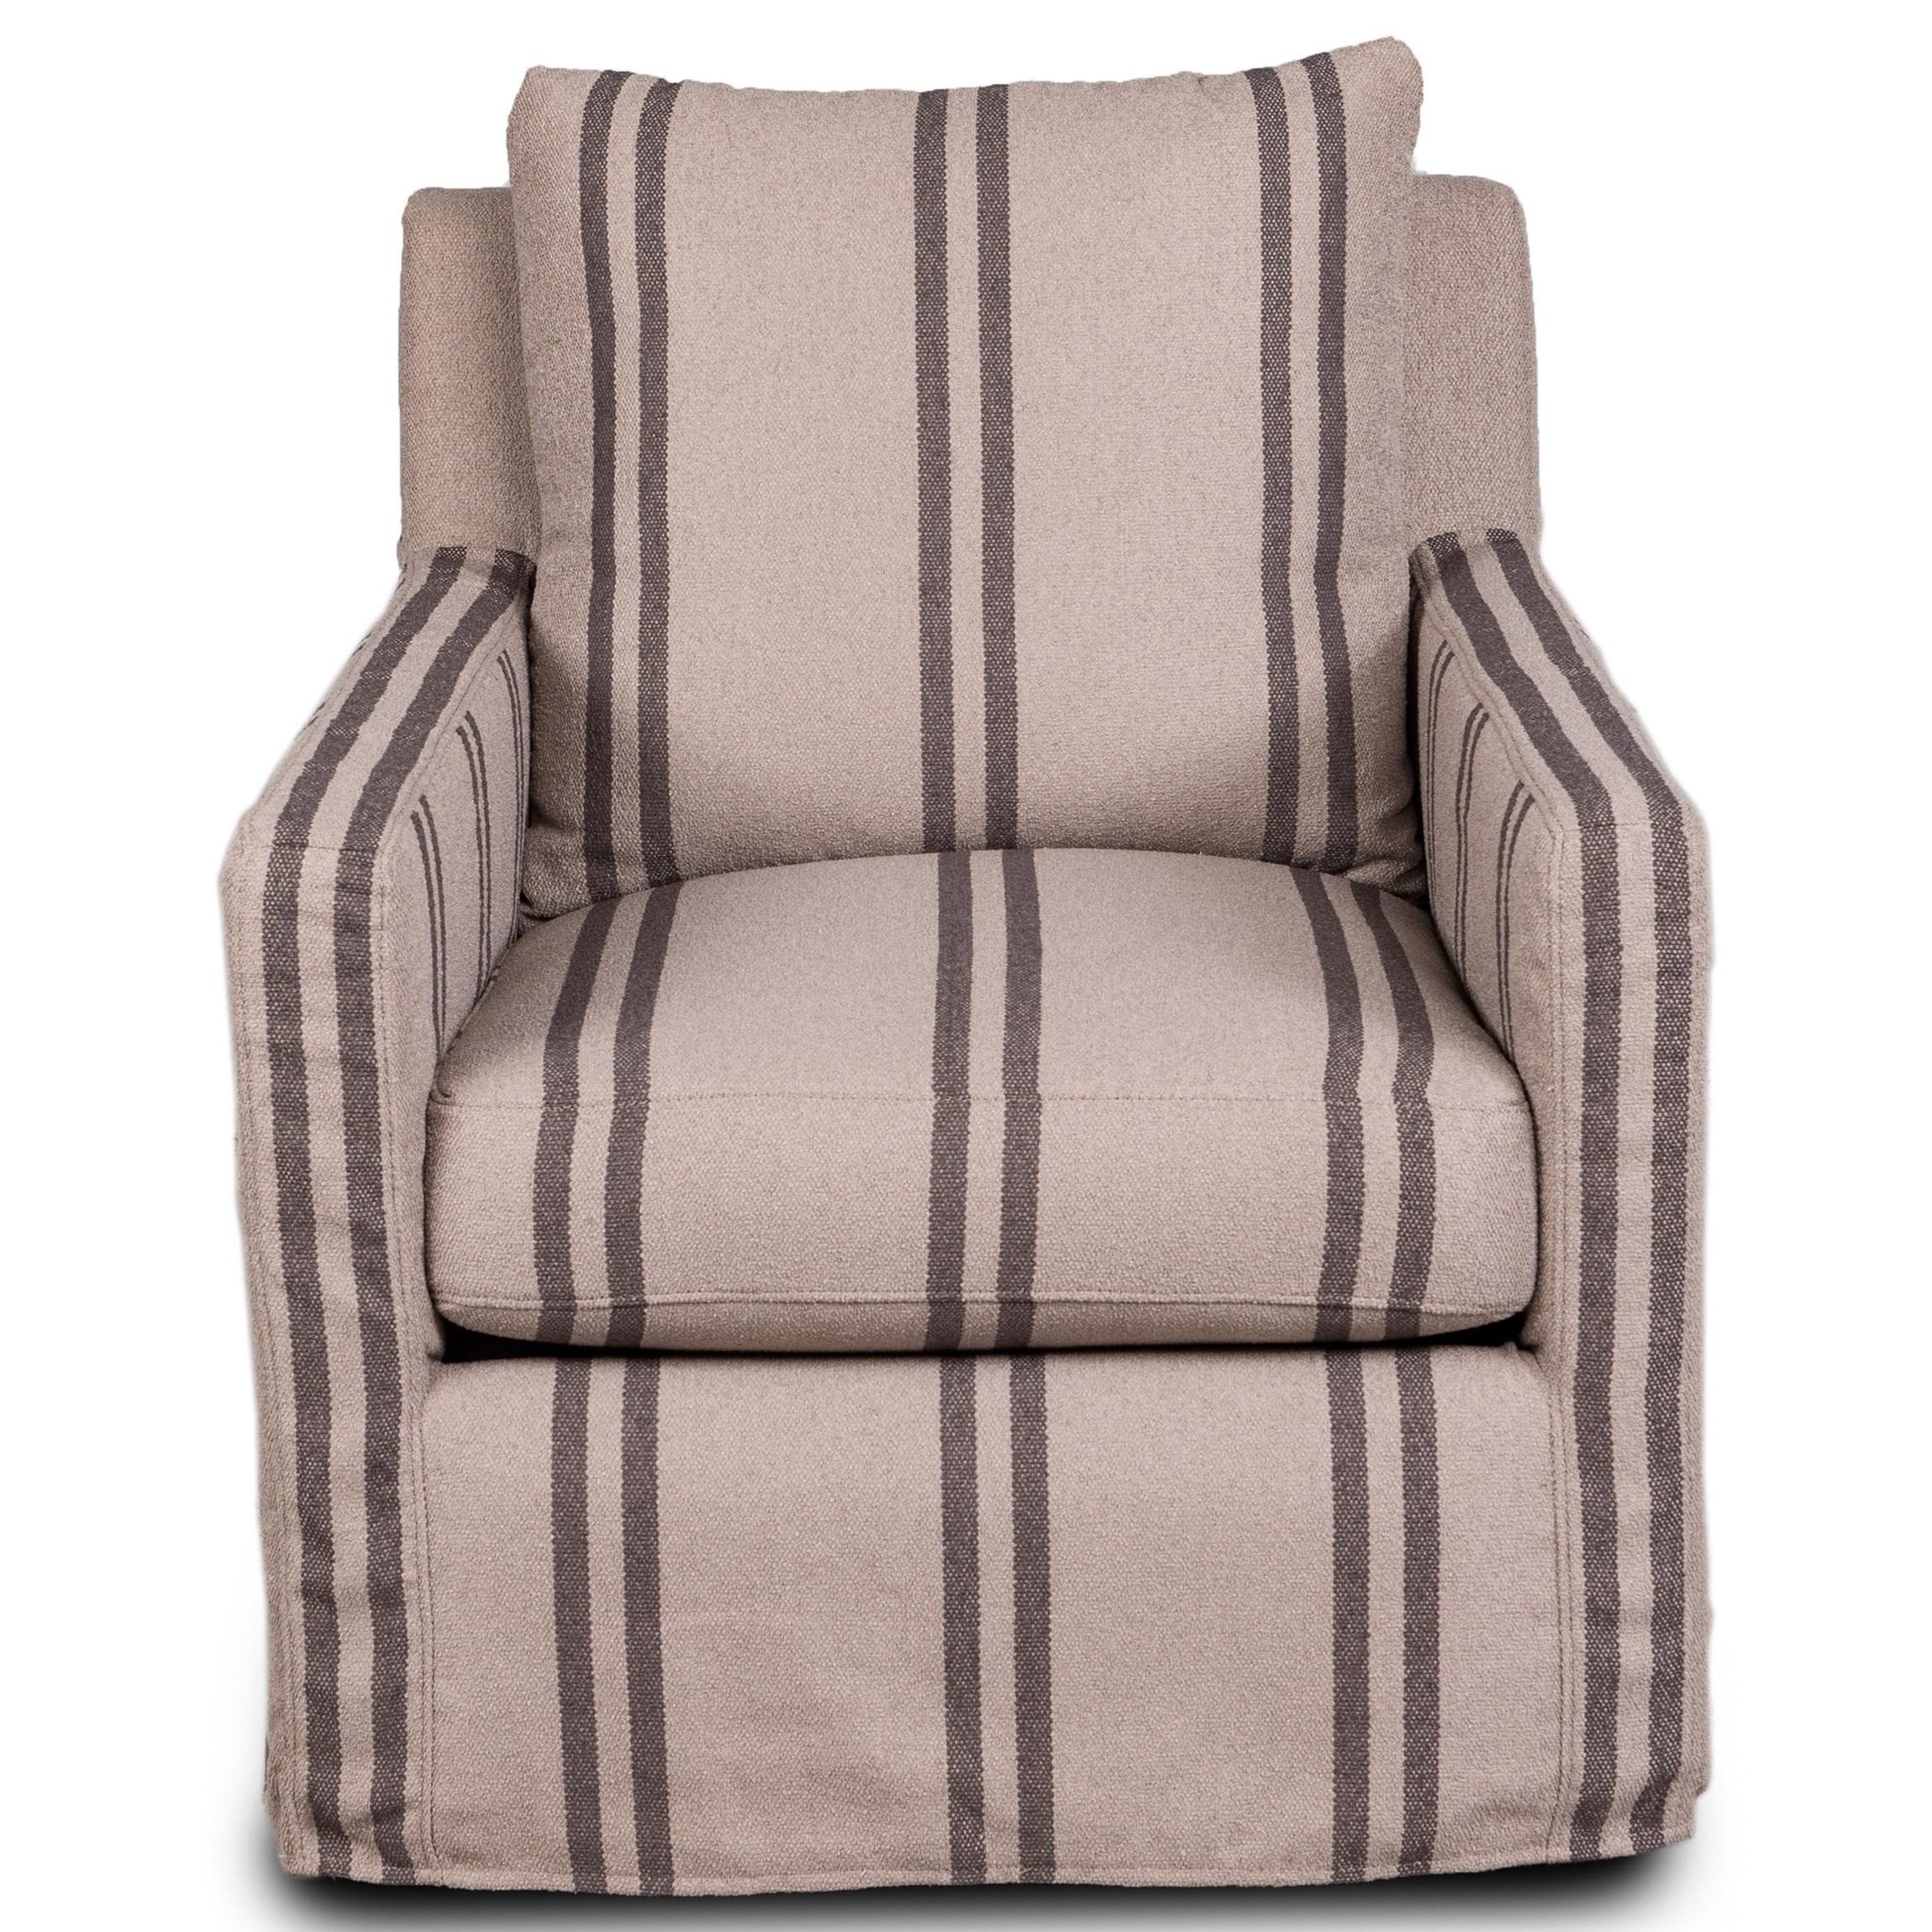 1595 Slipcover Swivel Glider Chair at Belfort Furniture